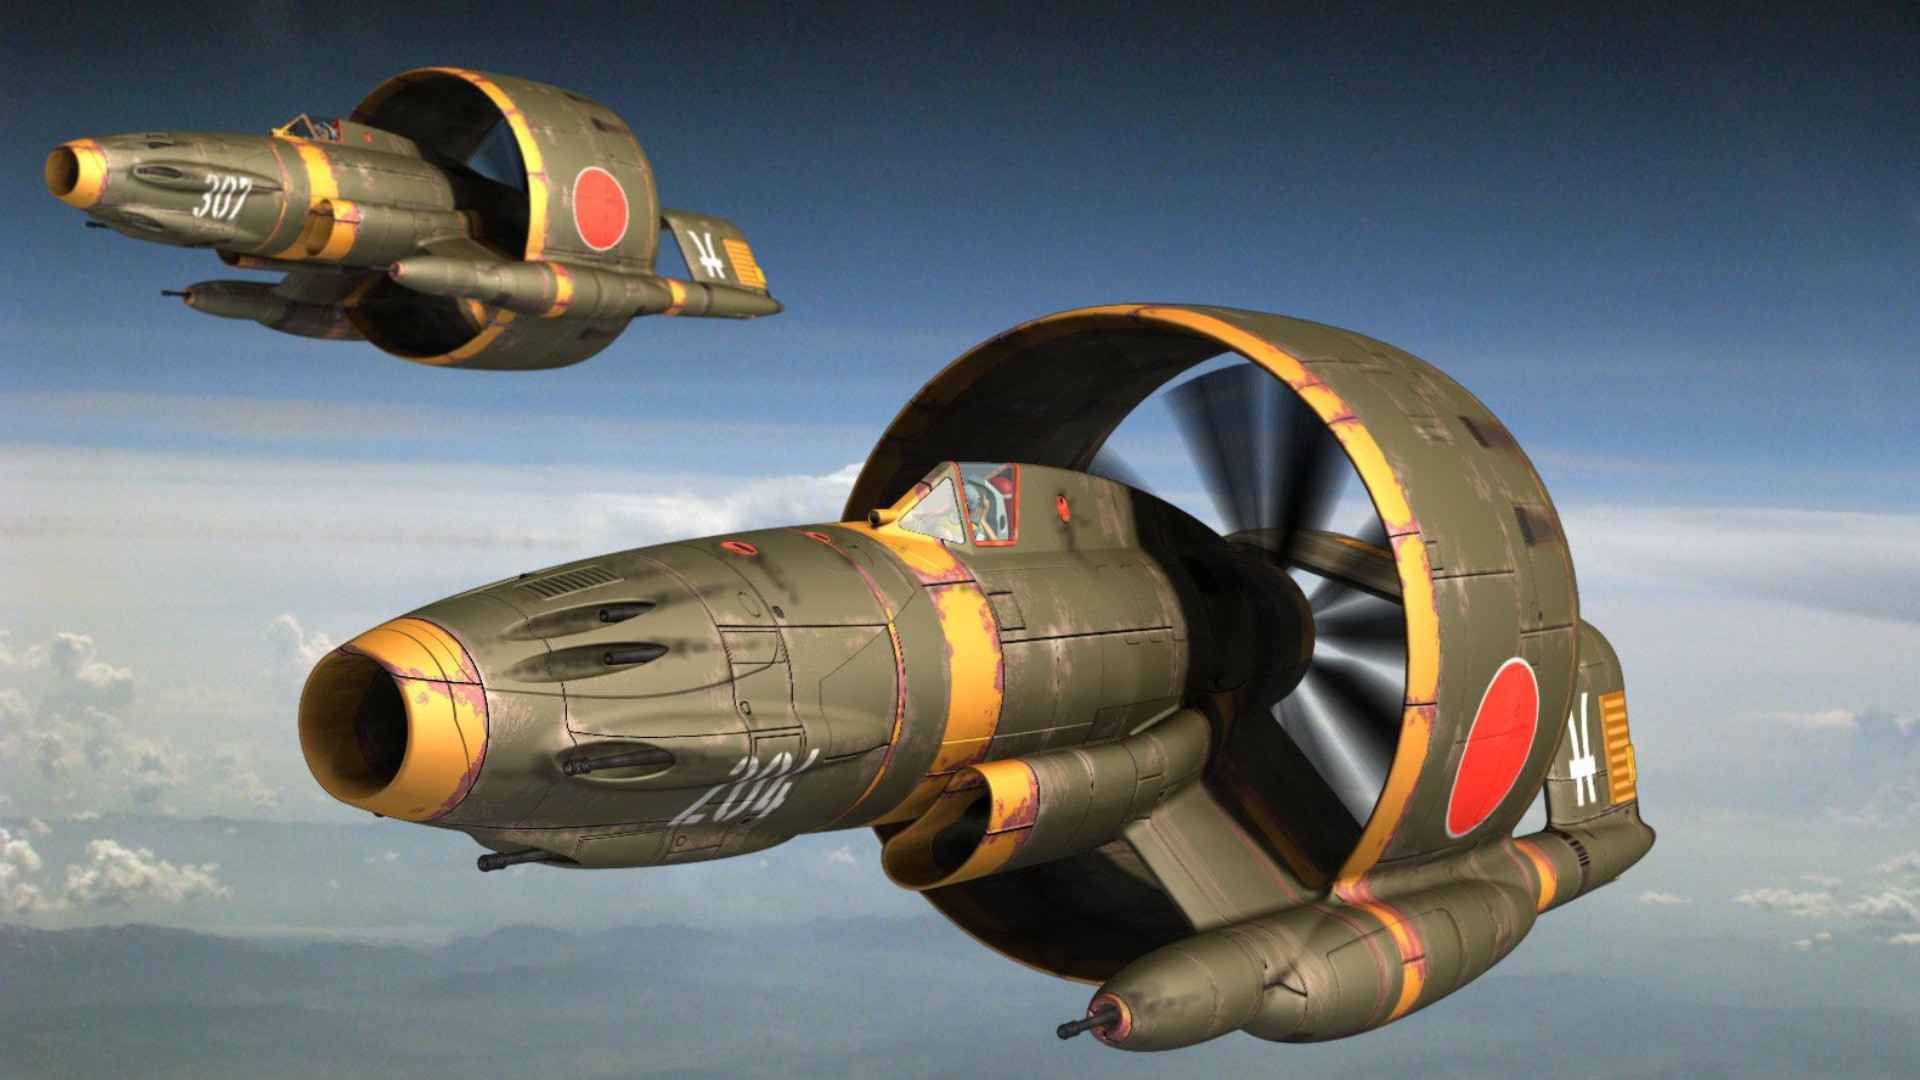 Sci Fi – Aircraft Wallpaper